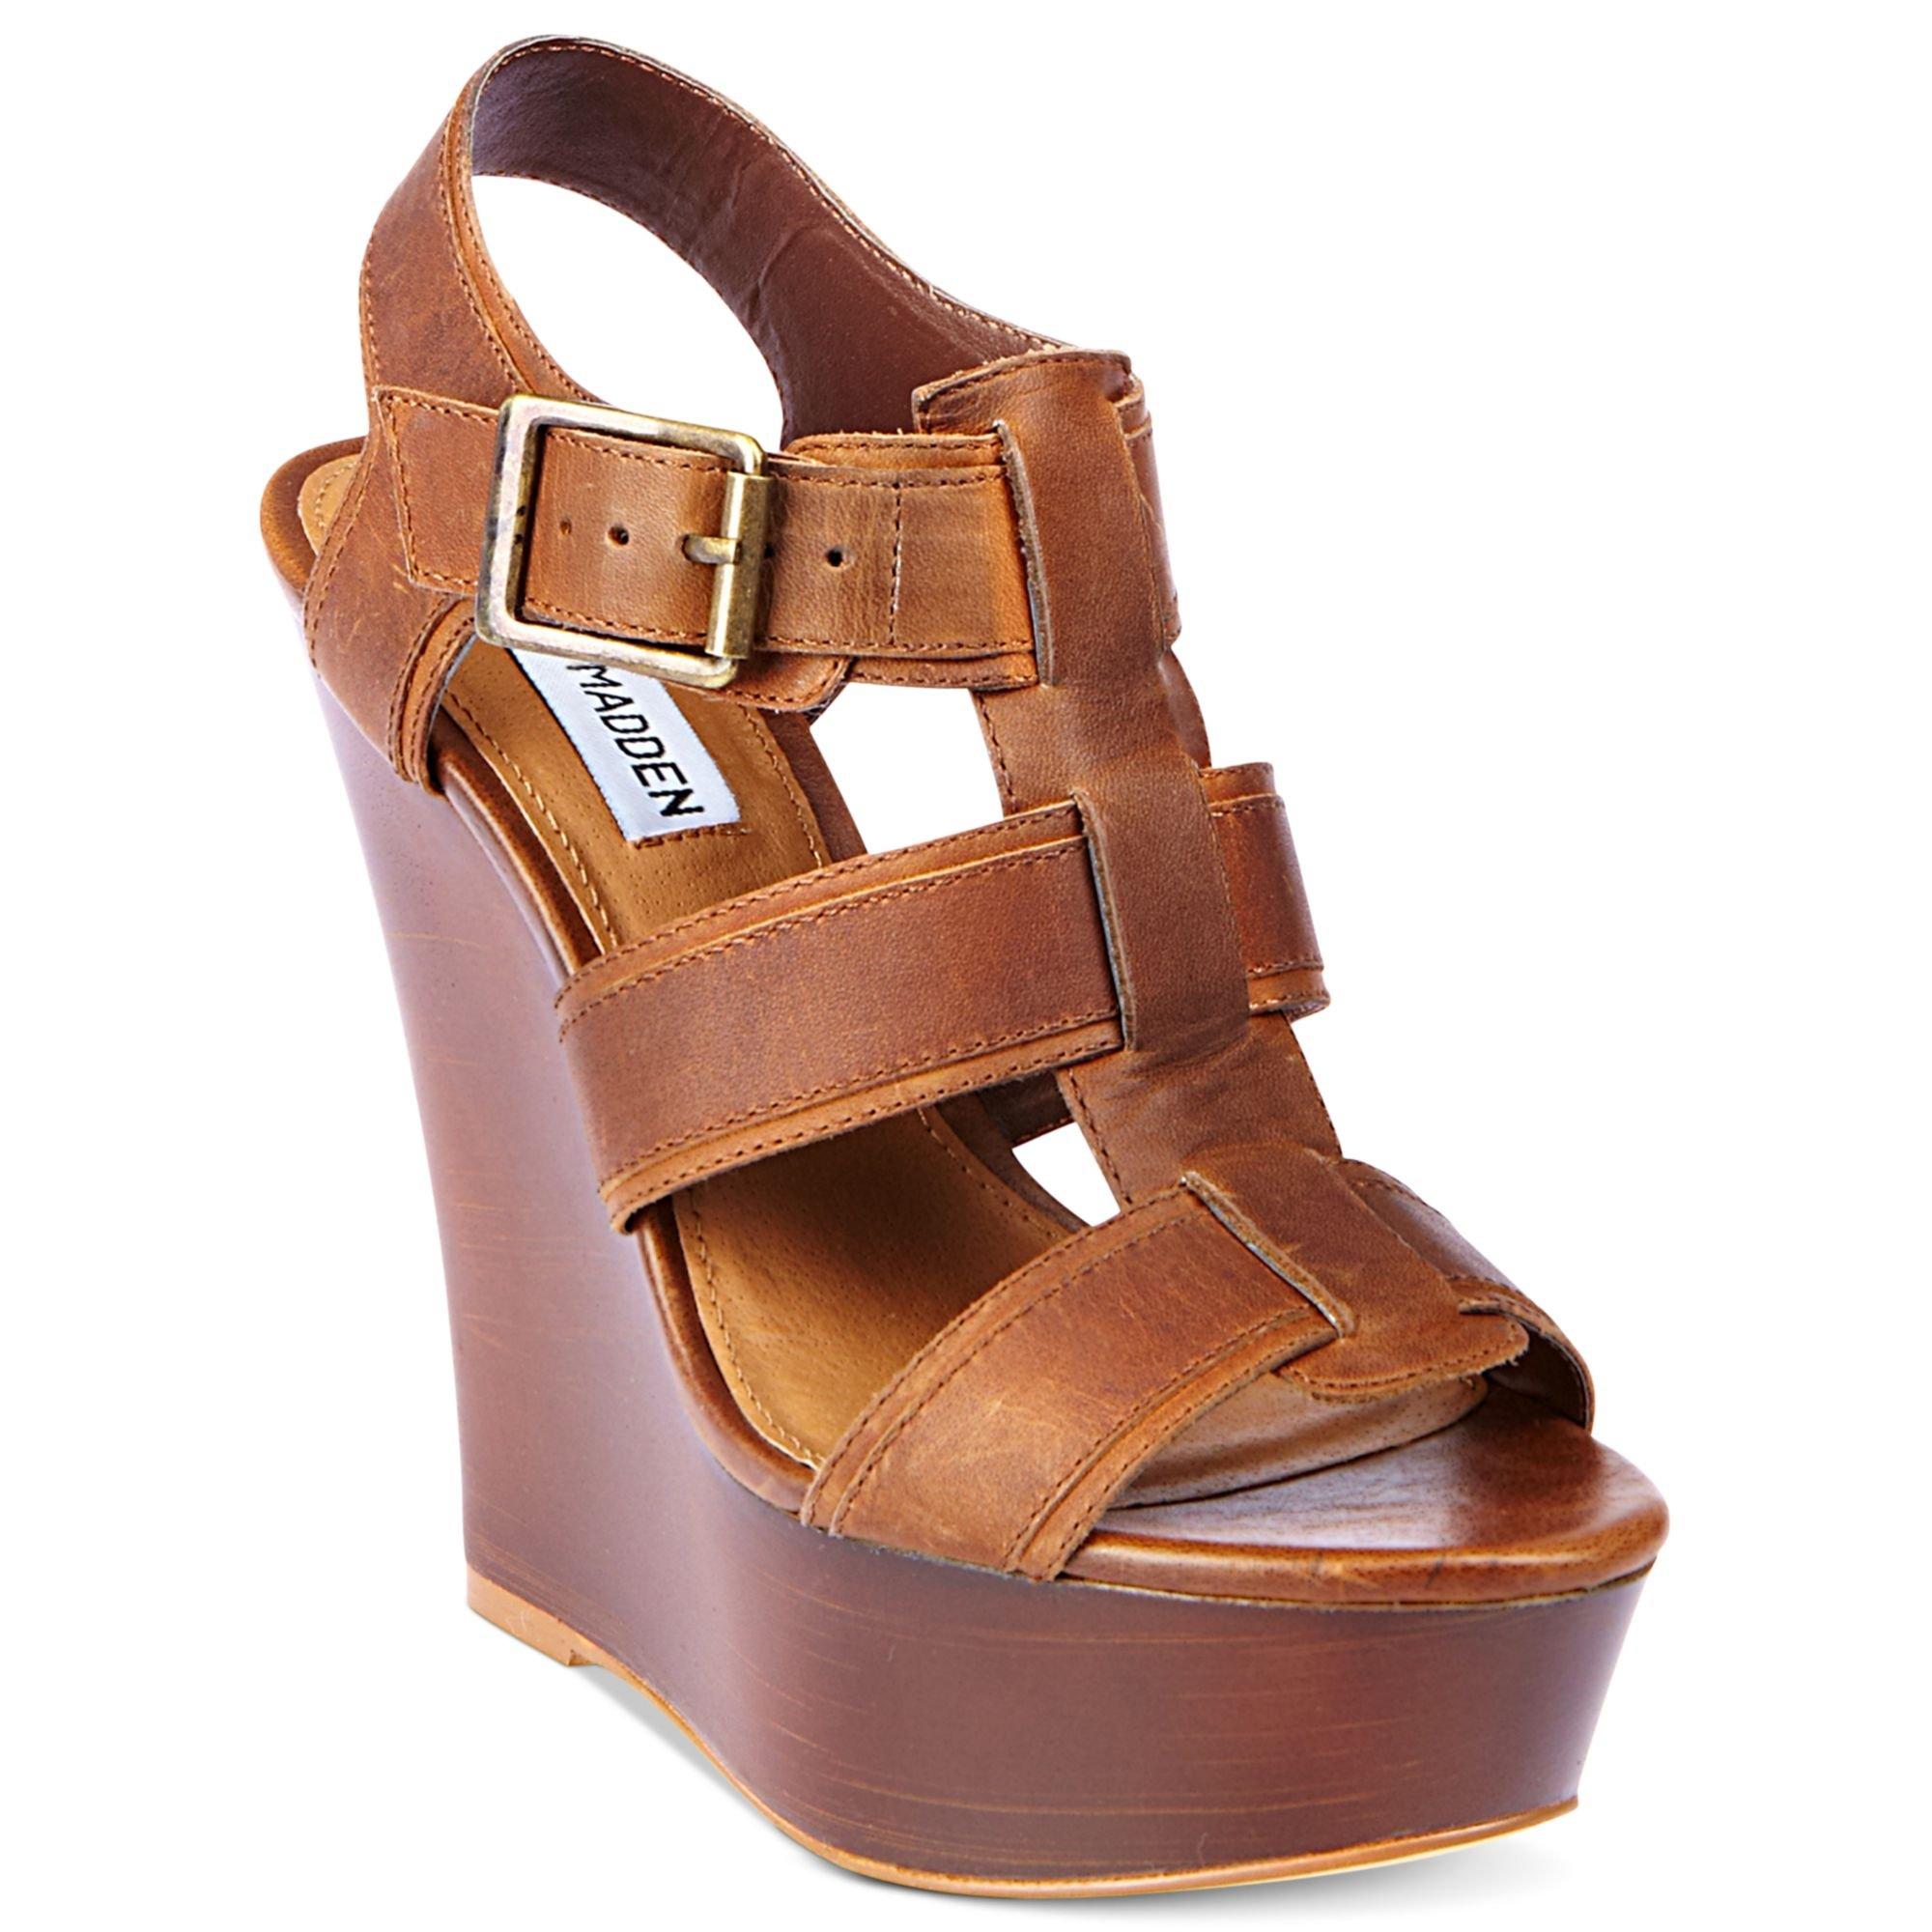 06584e21076 Steve Madden Brown Wanting Platform Wedge Sandals